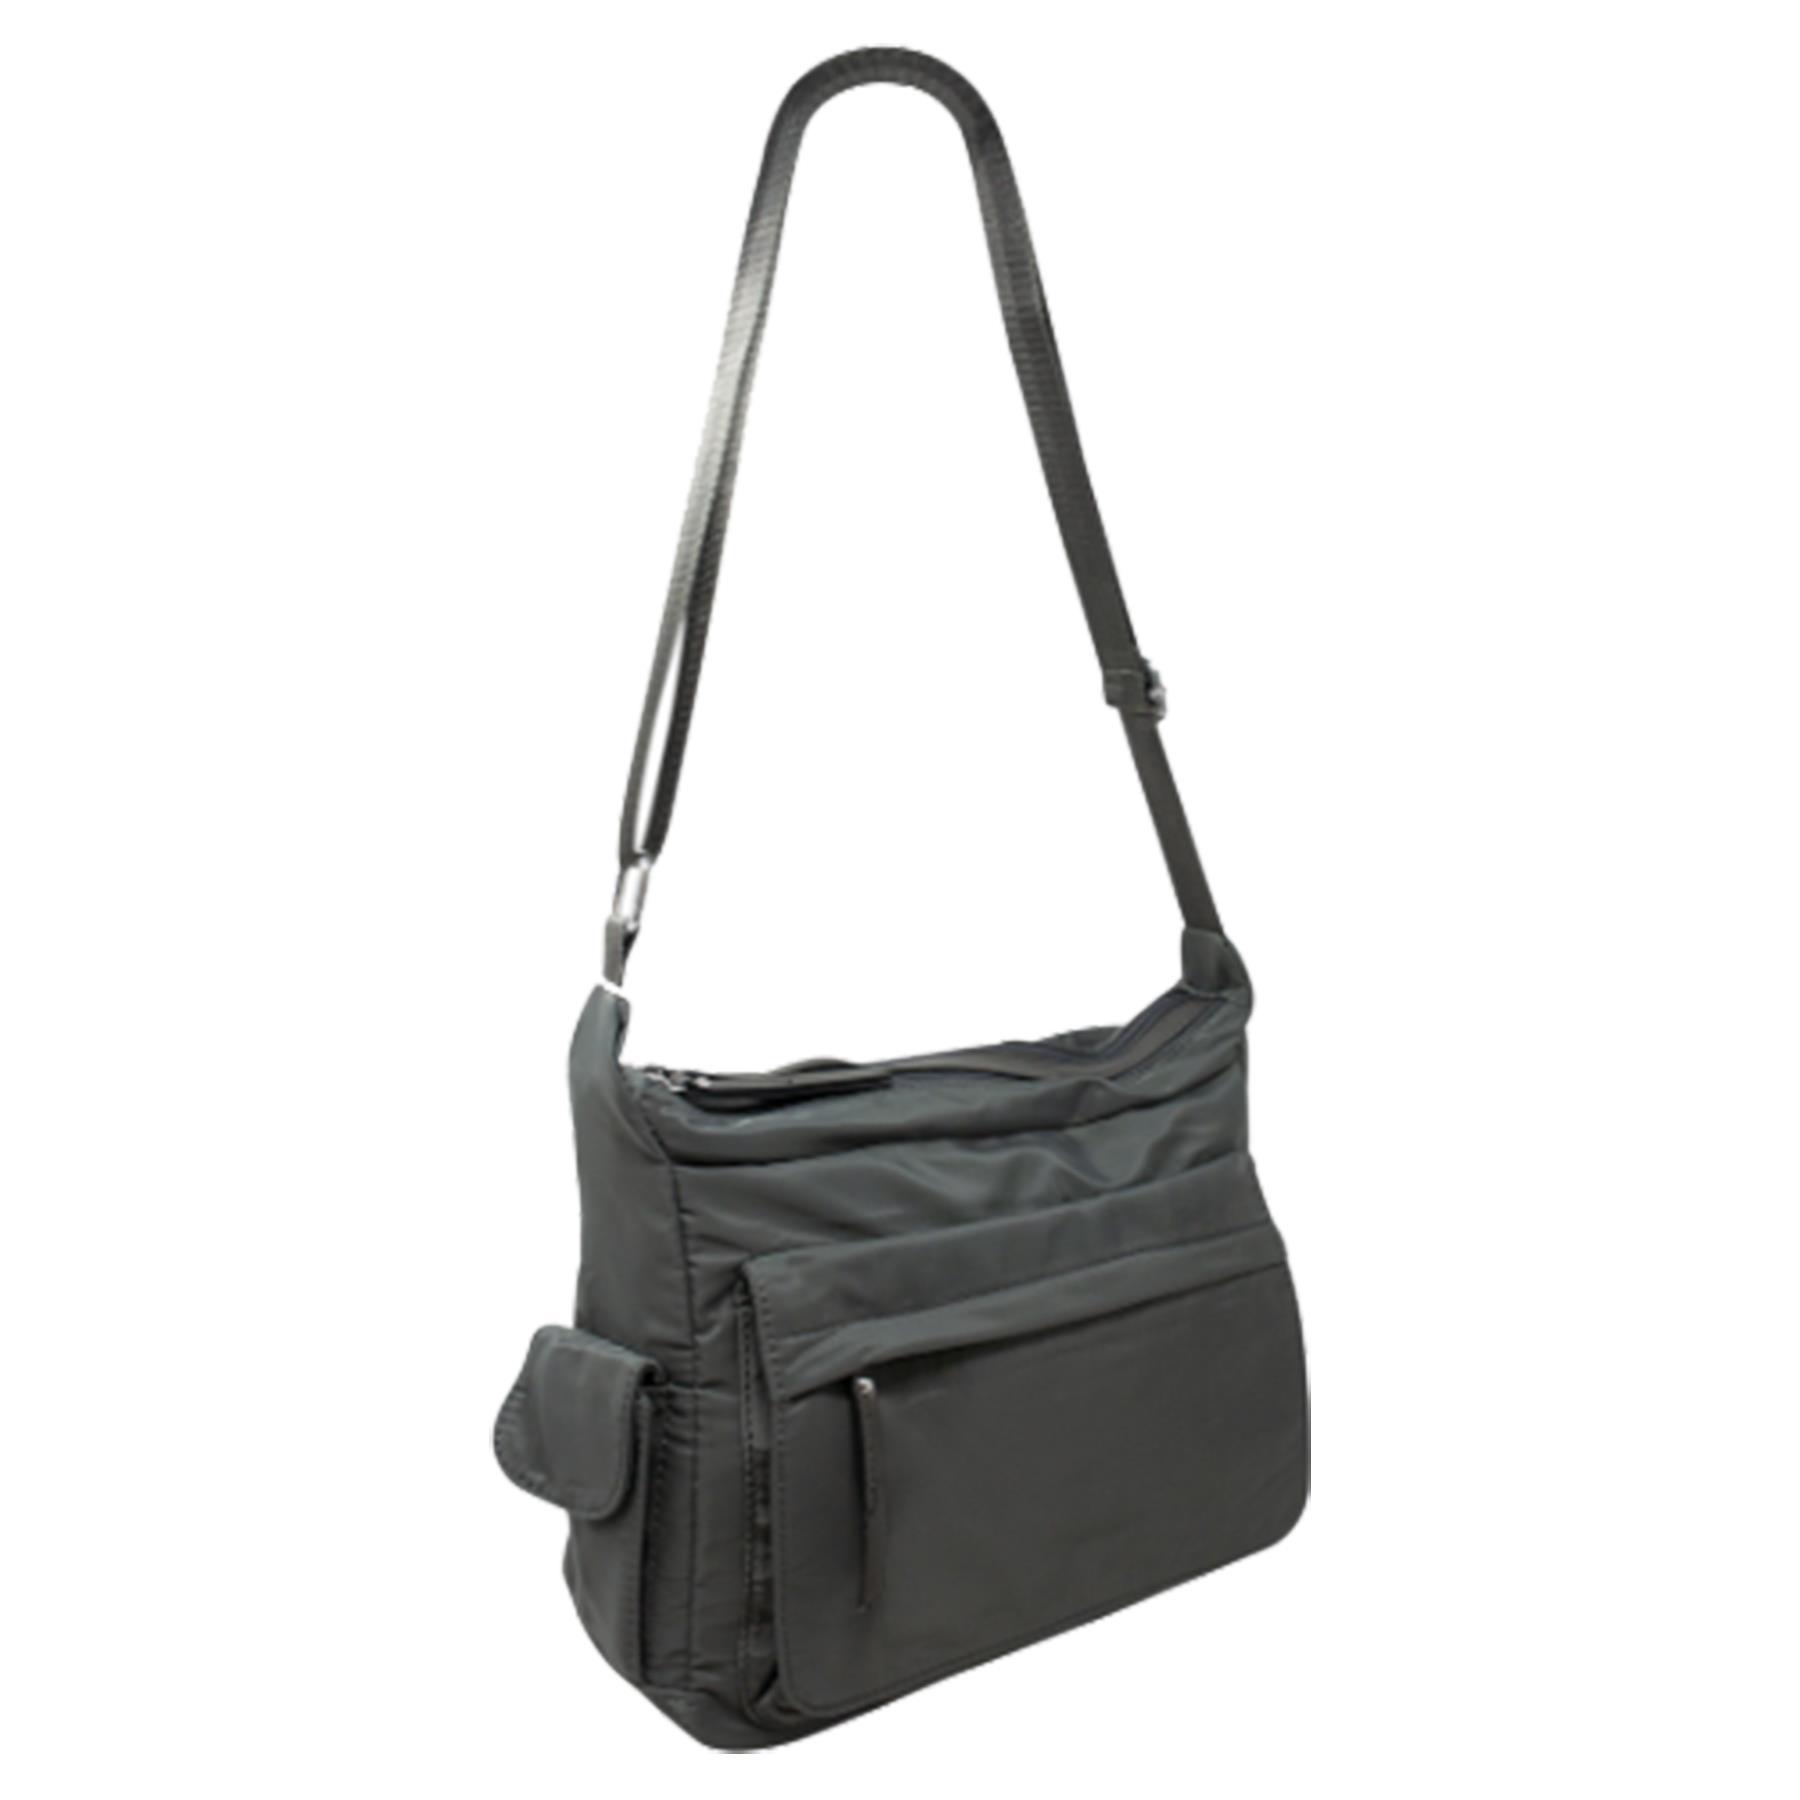 New-Ladies-Men-s-Showerproof-School-College-Practical-Basic-Crossbody-Bag thumbnail 24